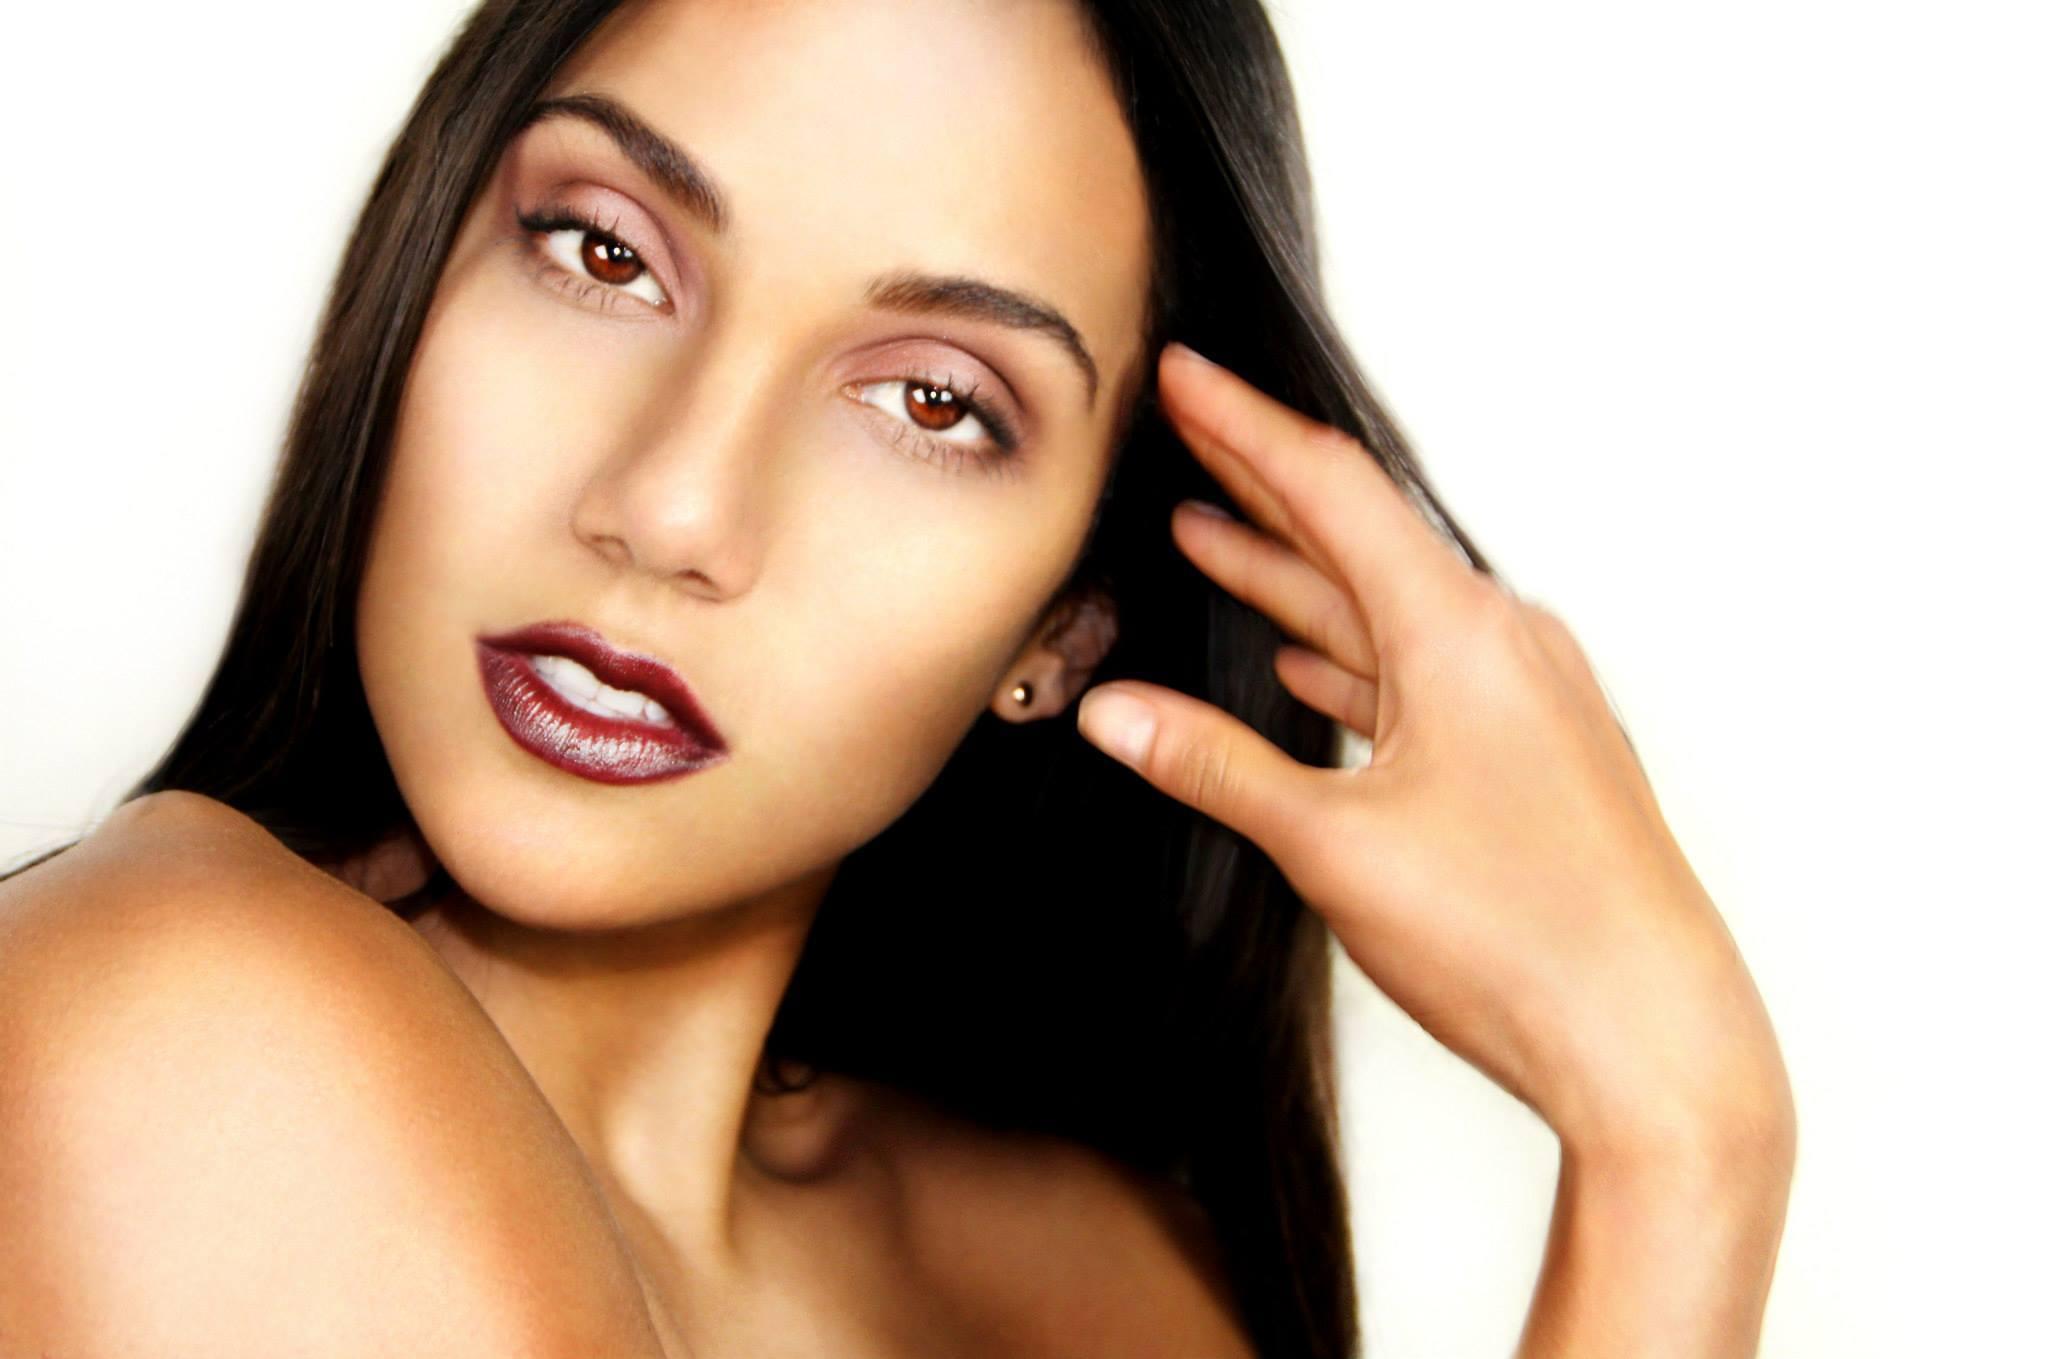 lorena larriviere, 8va finalista de reyna hispanoamericana 2017/miss supranational peru 2015. Ye36ys10